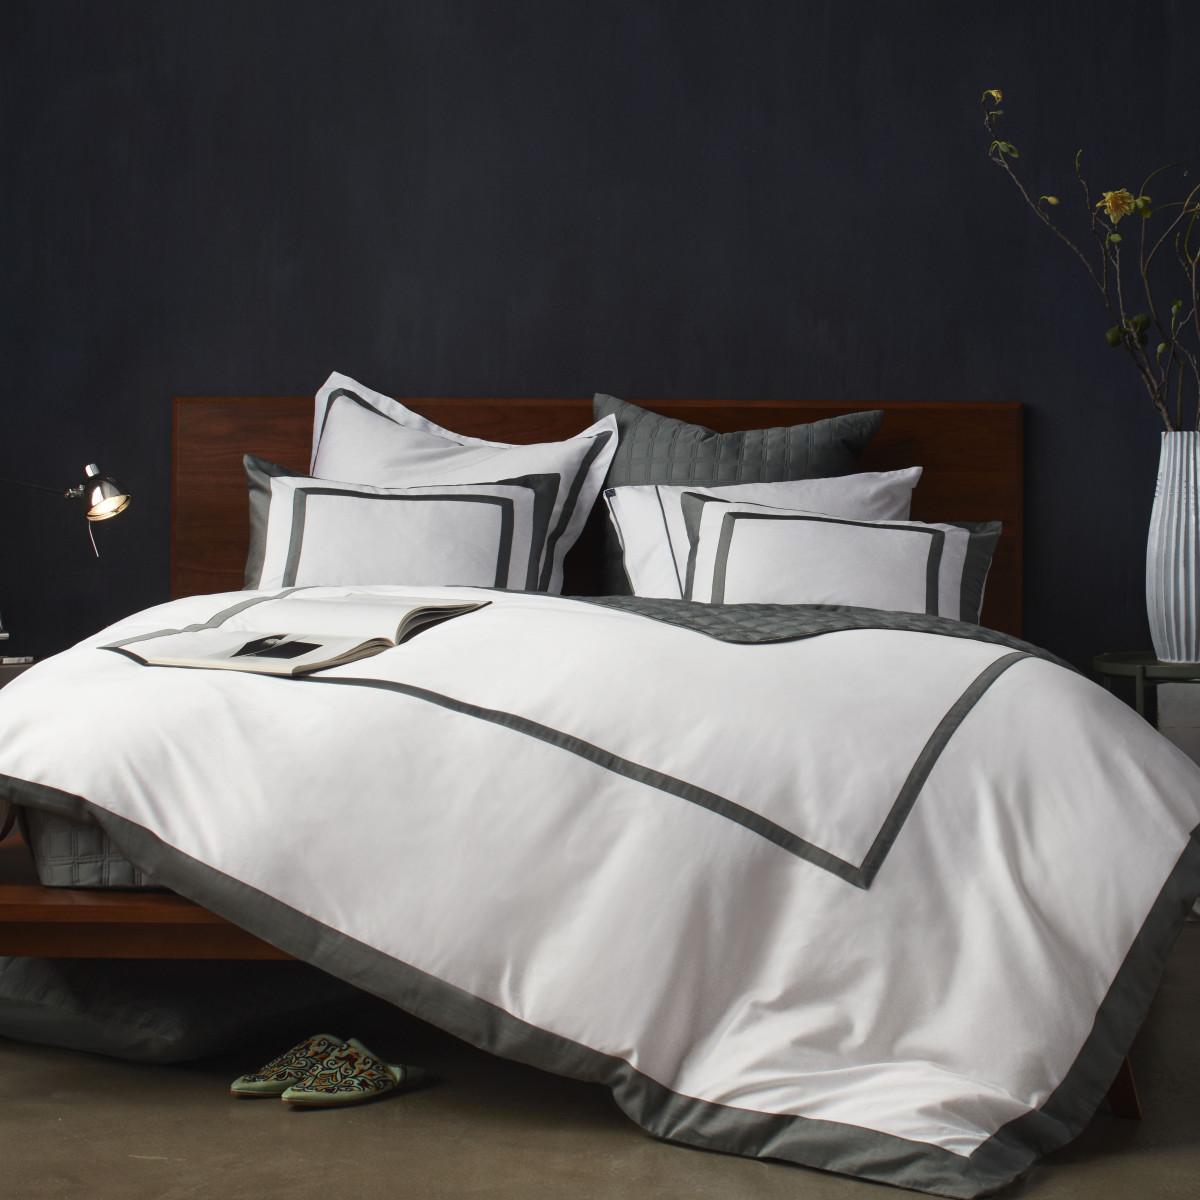 10 Grove bedding Olive